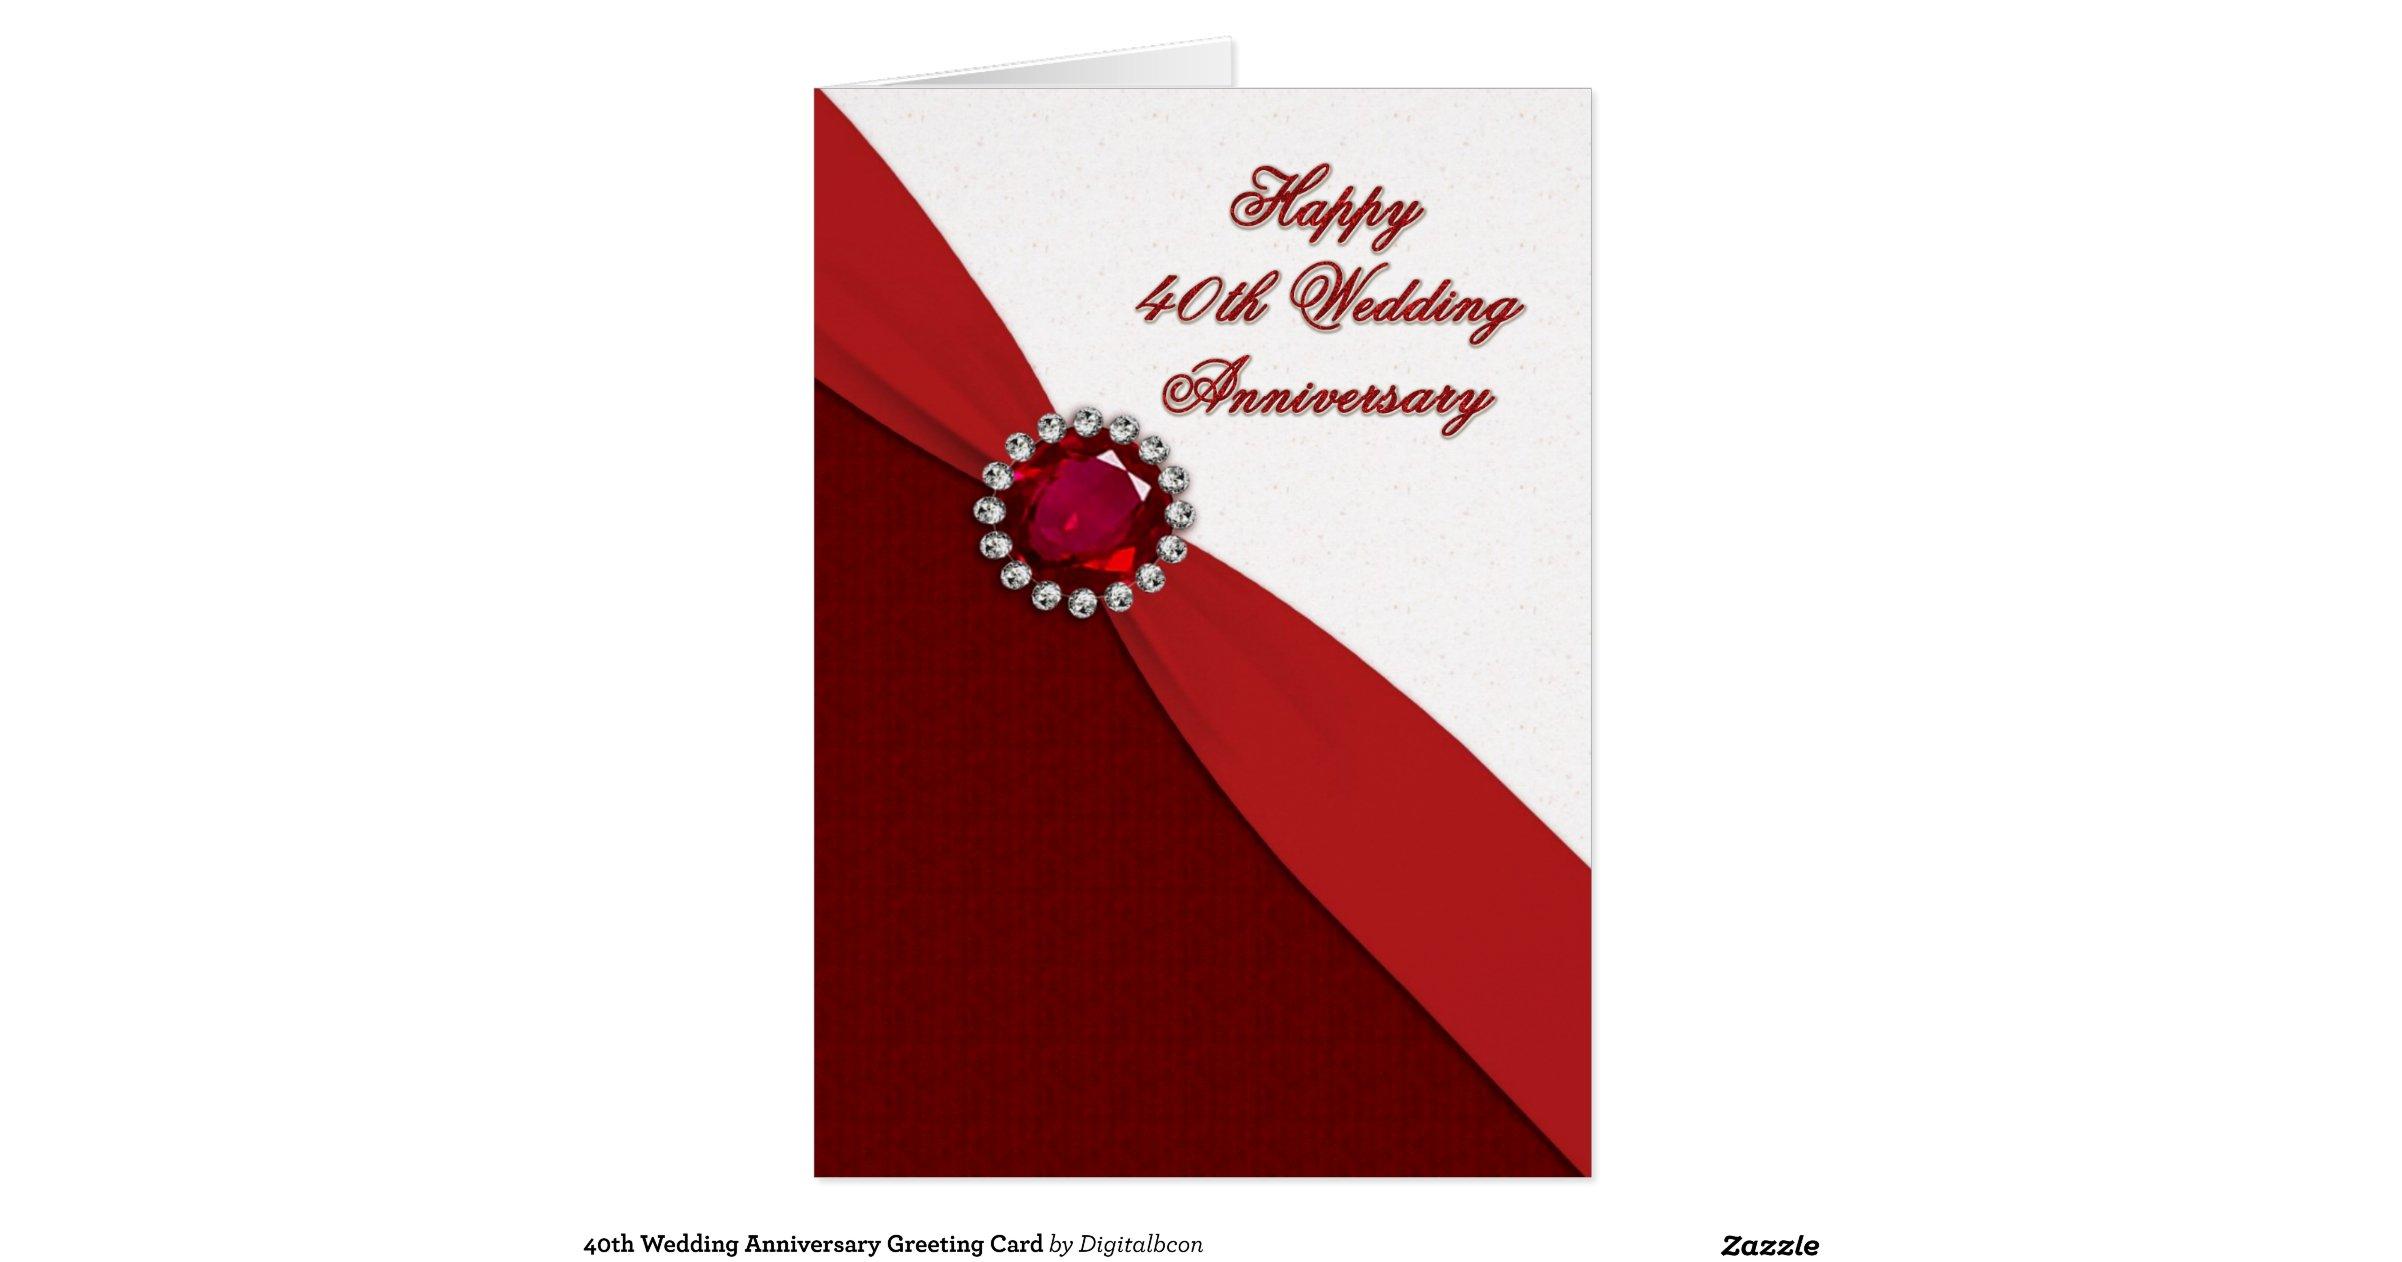 Snap Wedding Anniversary Note Cards Zazzle photos on Pinterest